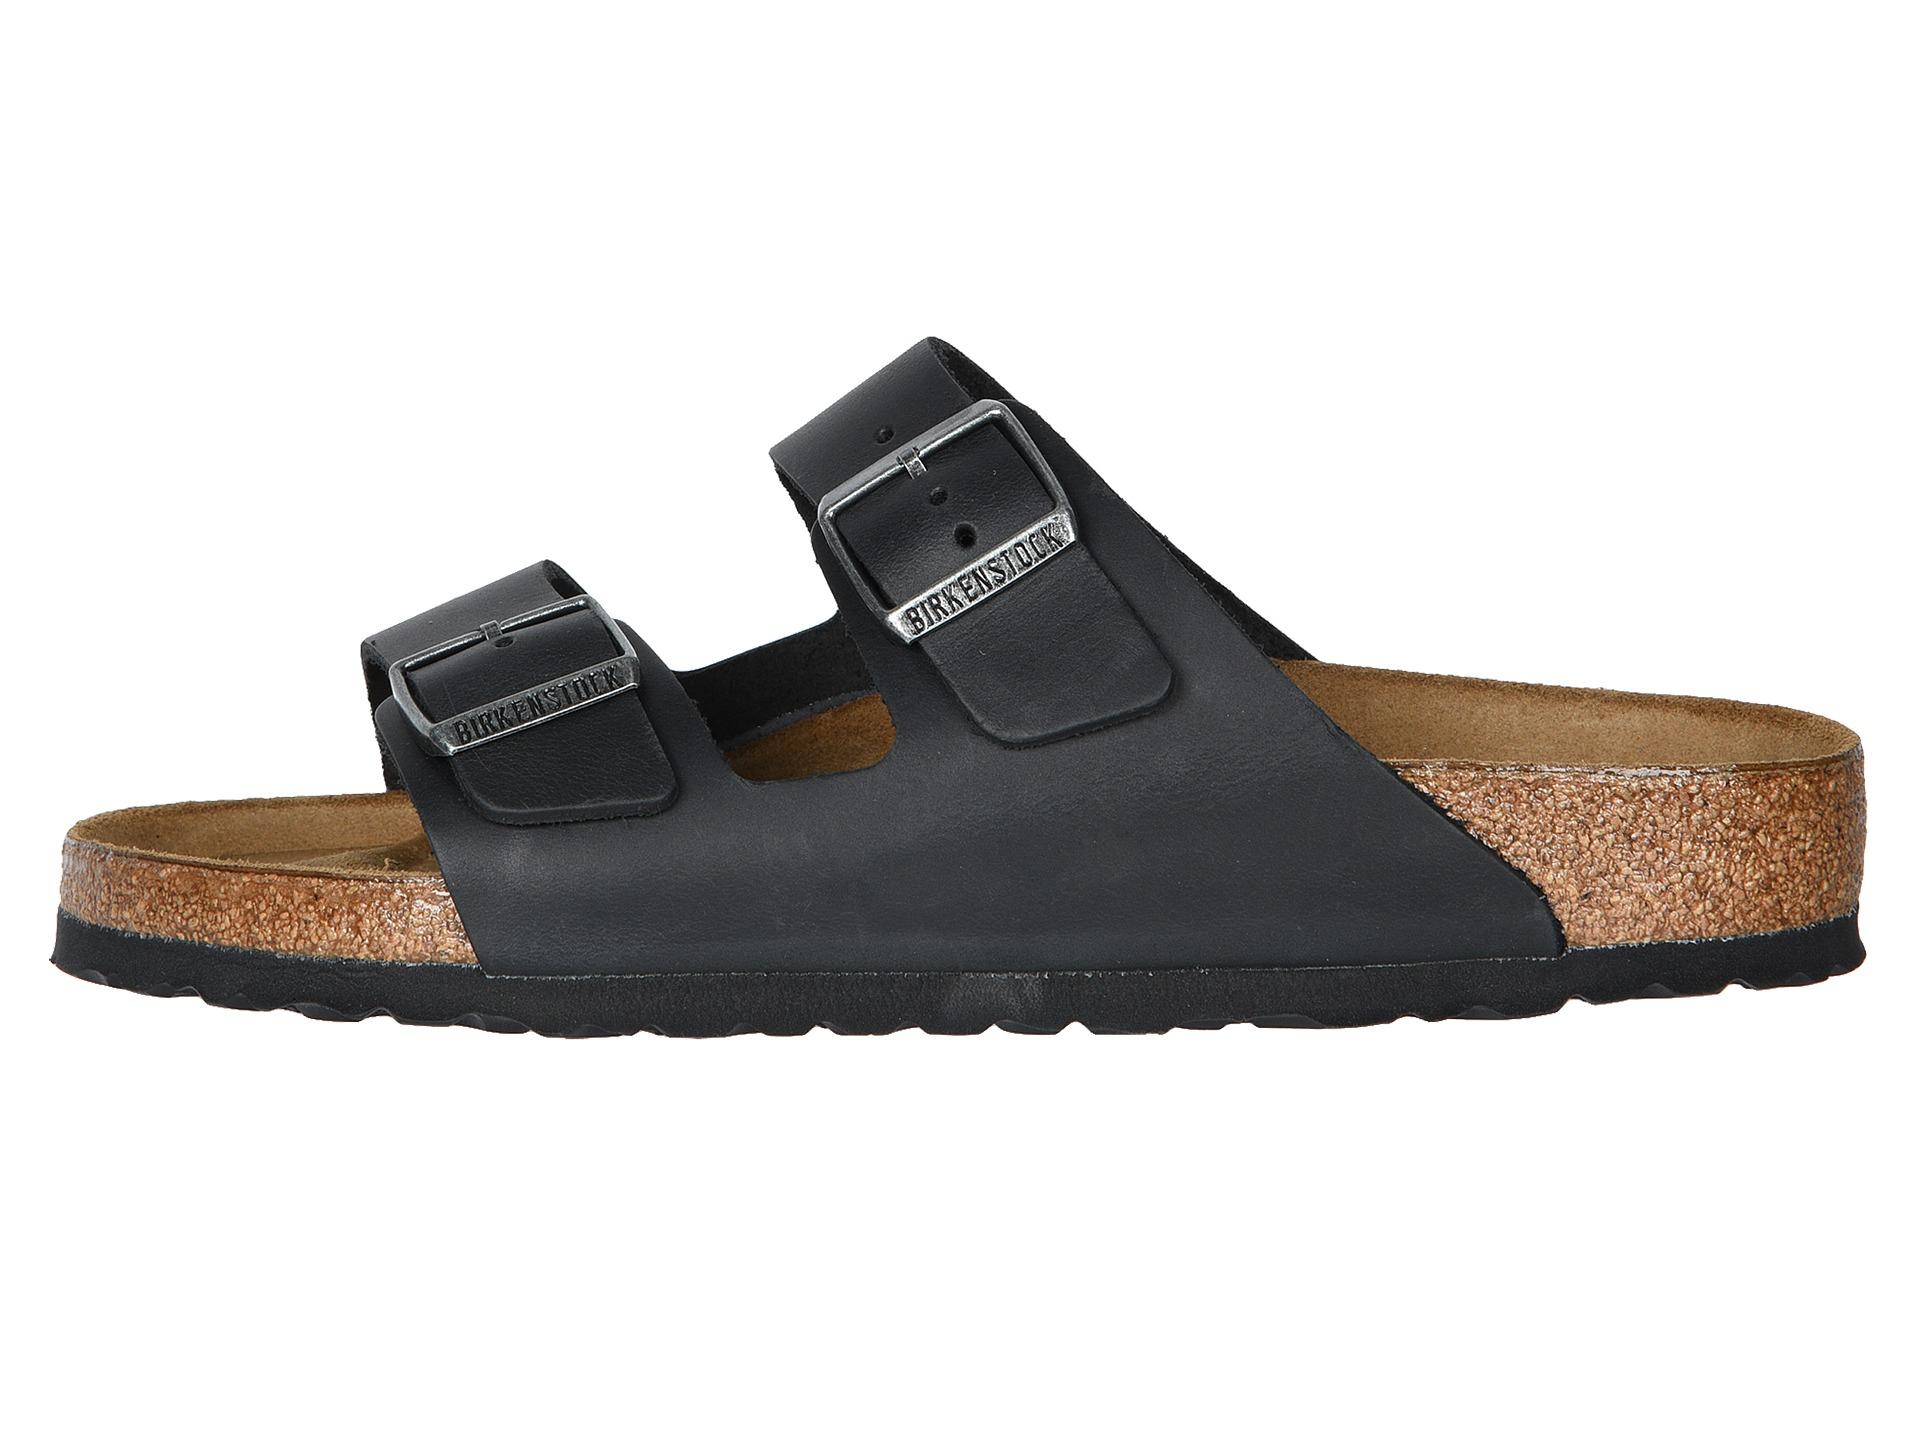 Birkenstock Shoes For Women